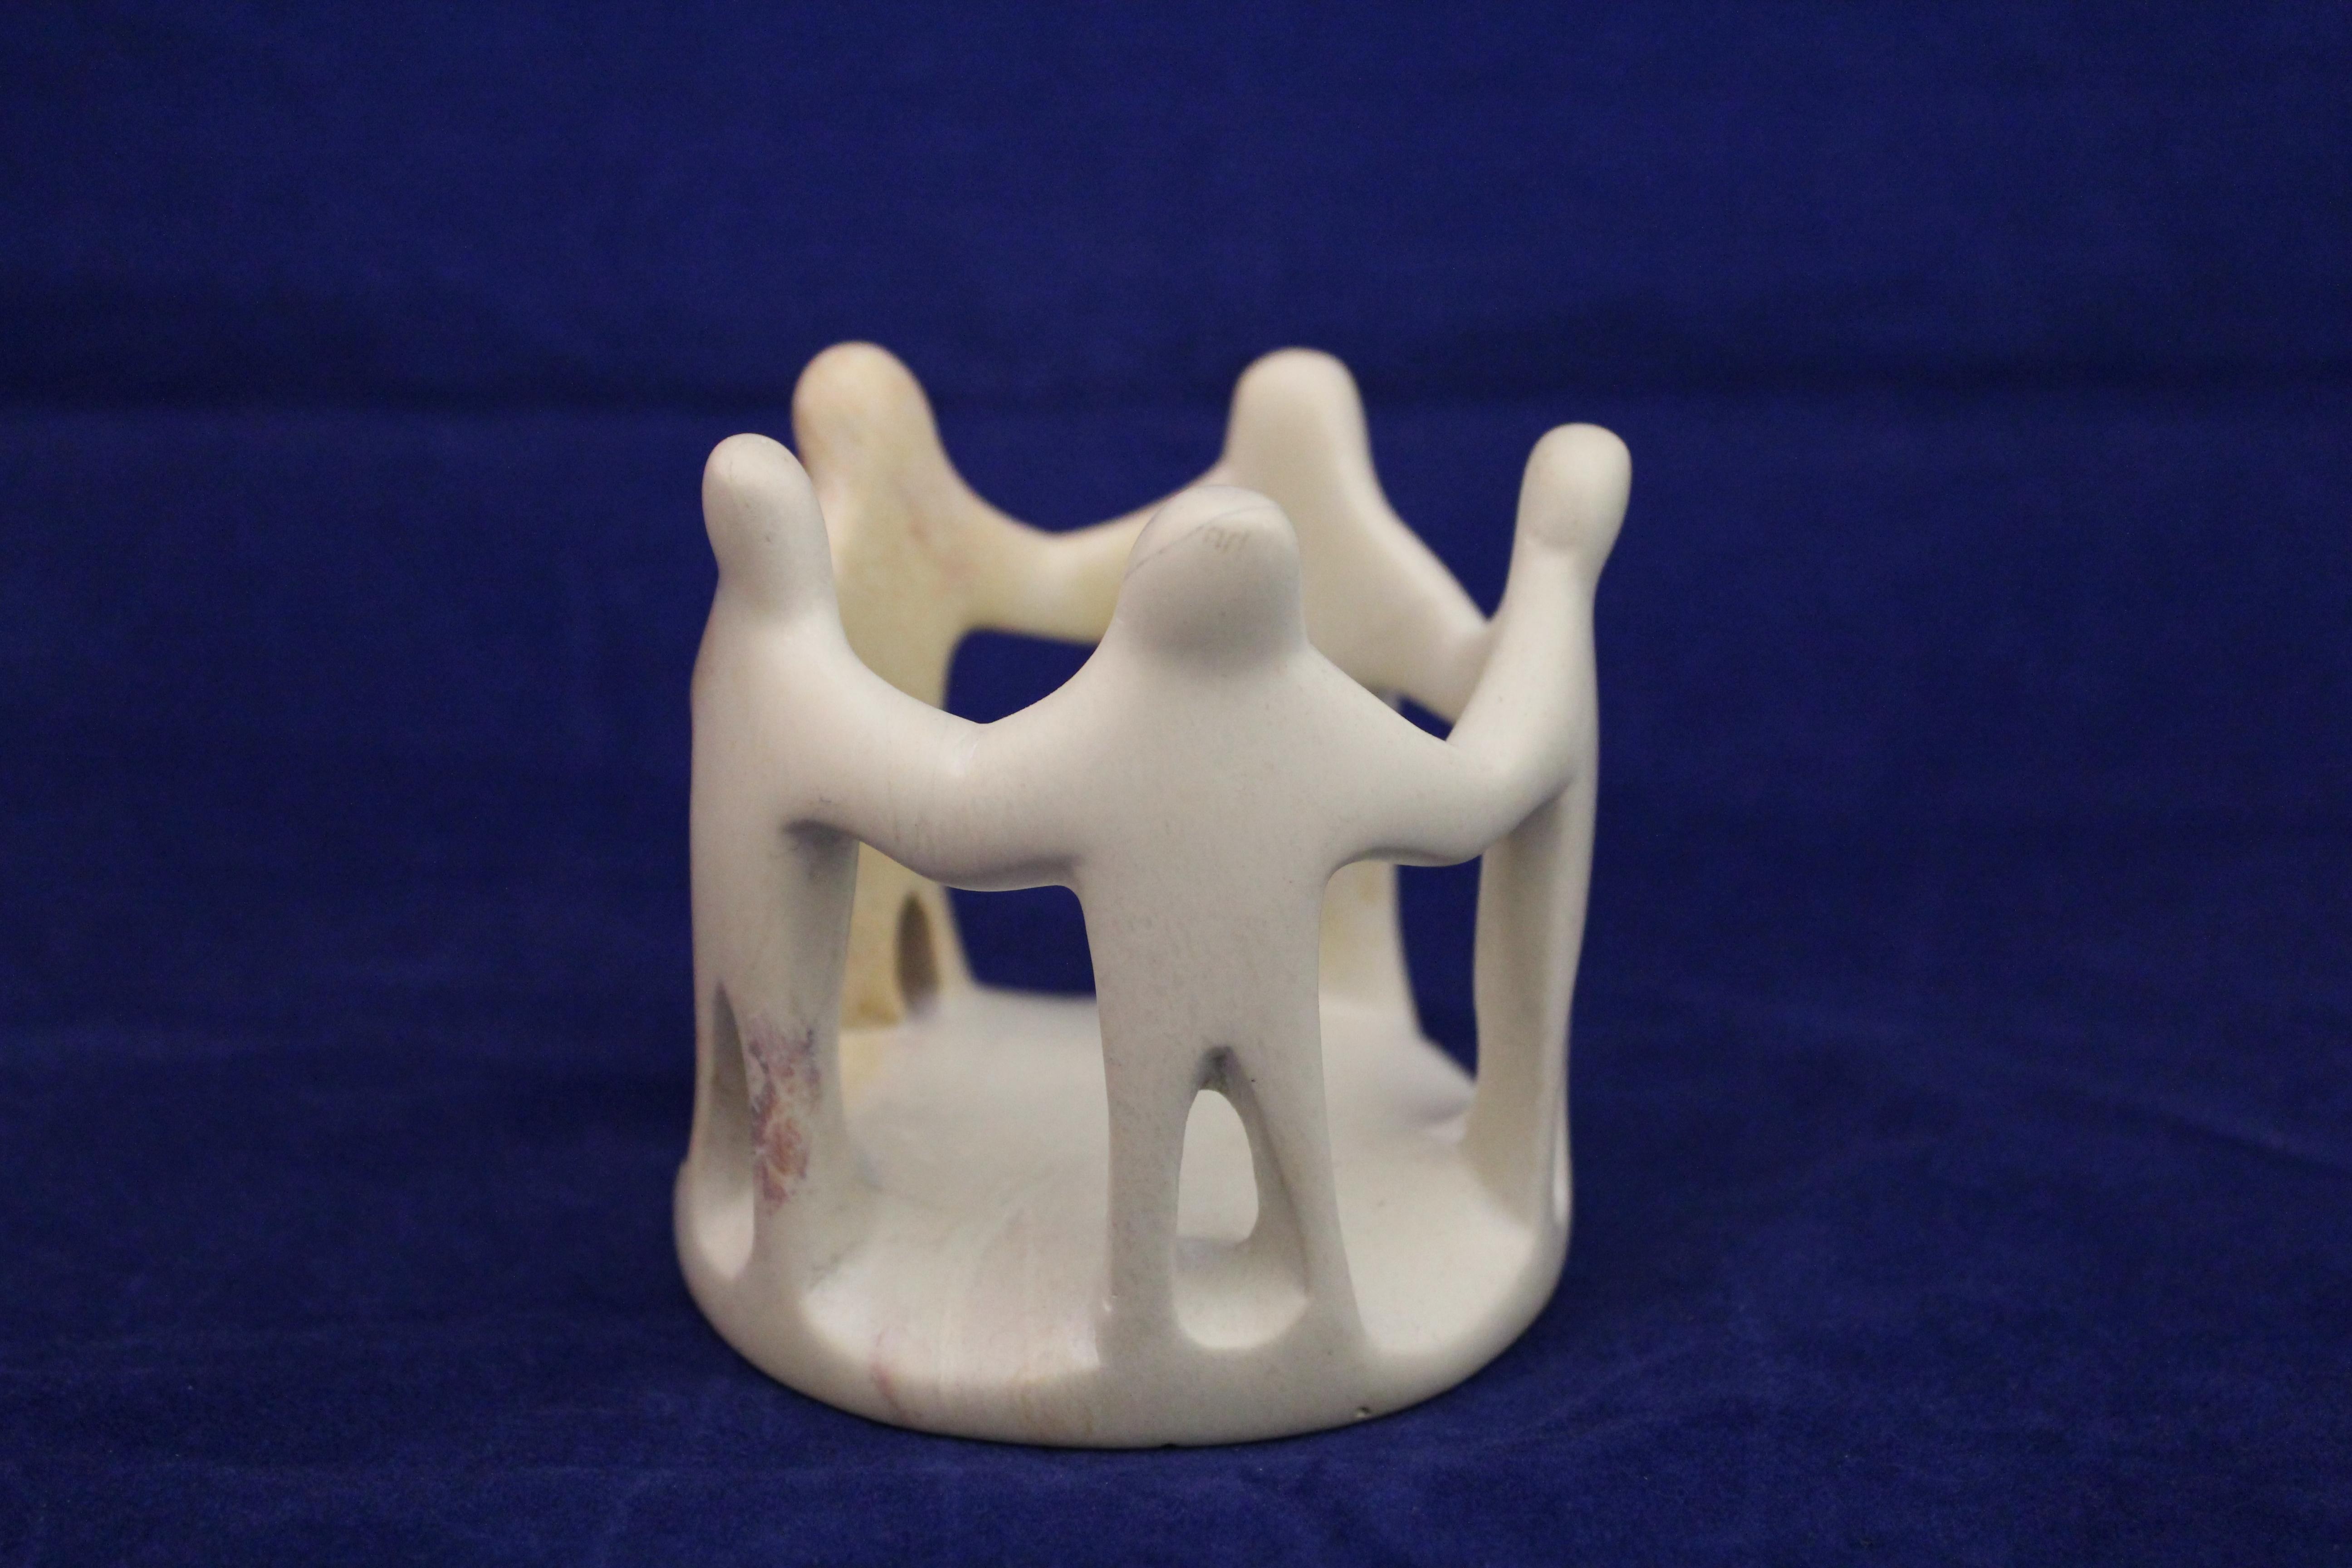 Kisii and Shona Sculpture, Researched by Clara Komrosky-Licata and Samantha Gooding